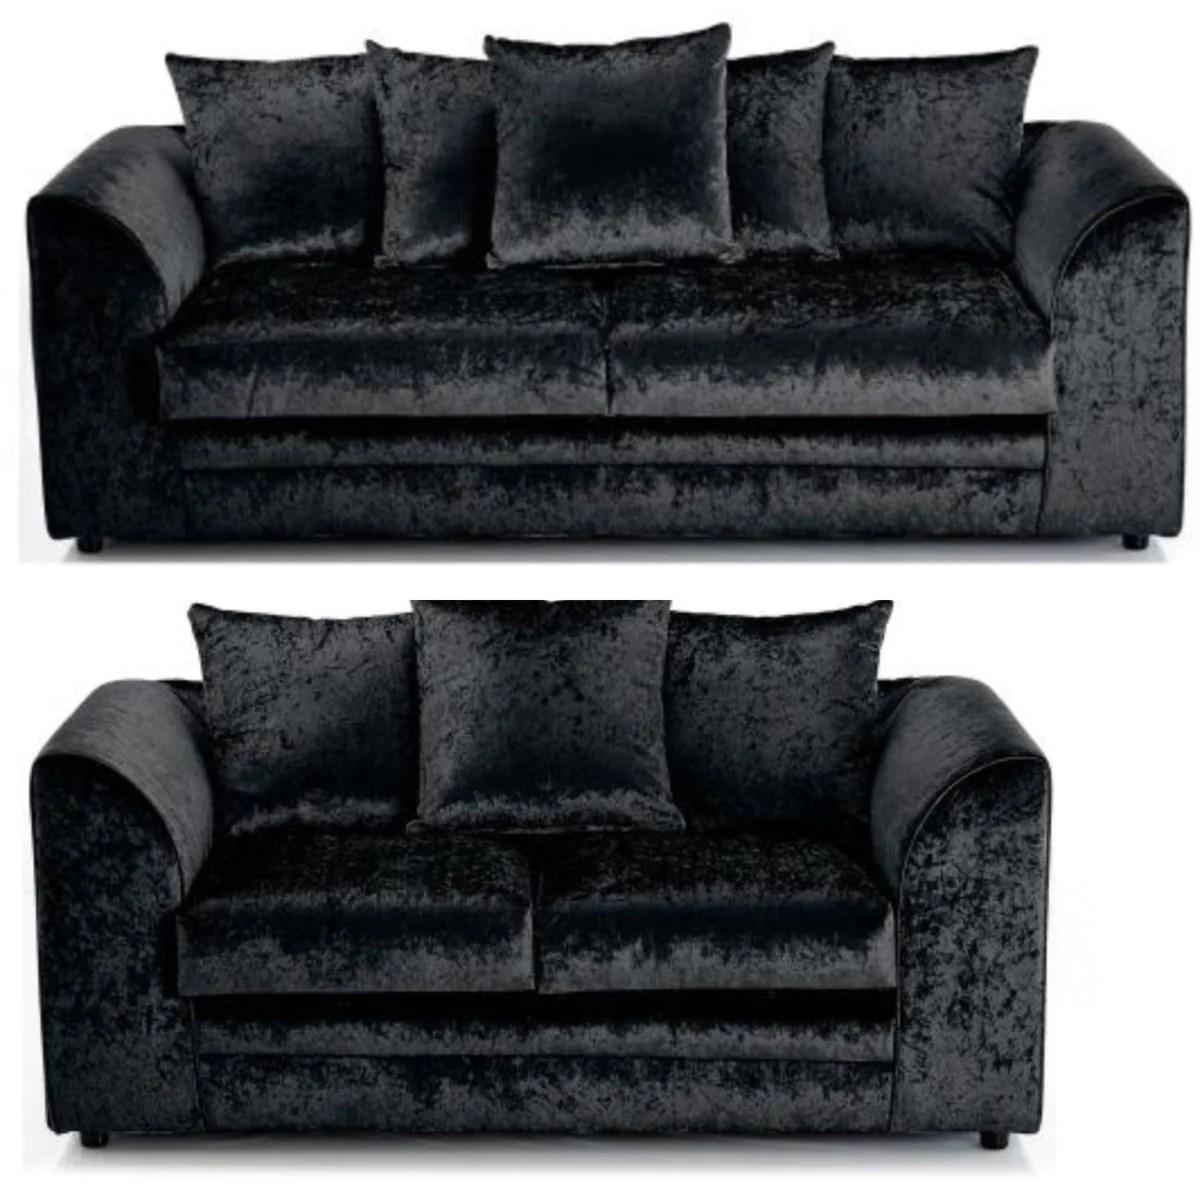 3 2 sofa deals ikea table lack paris glitz seater and set  patriot sofas